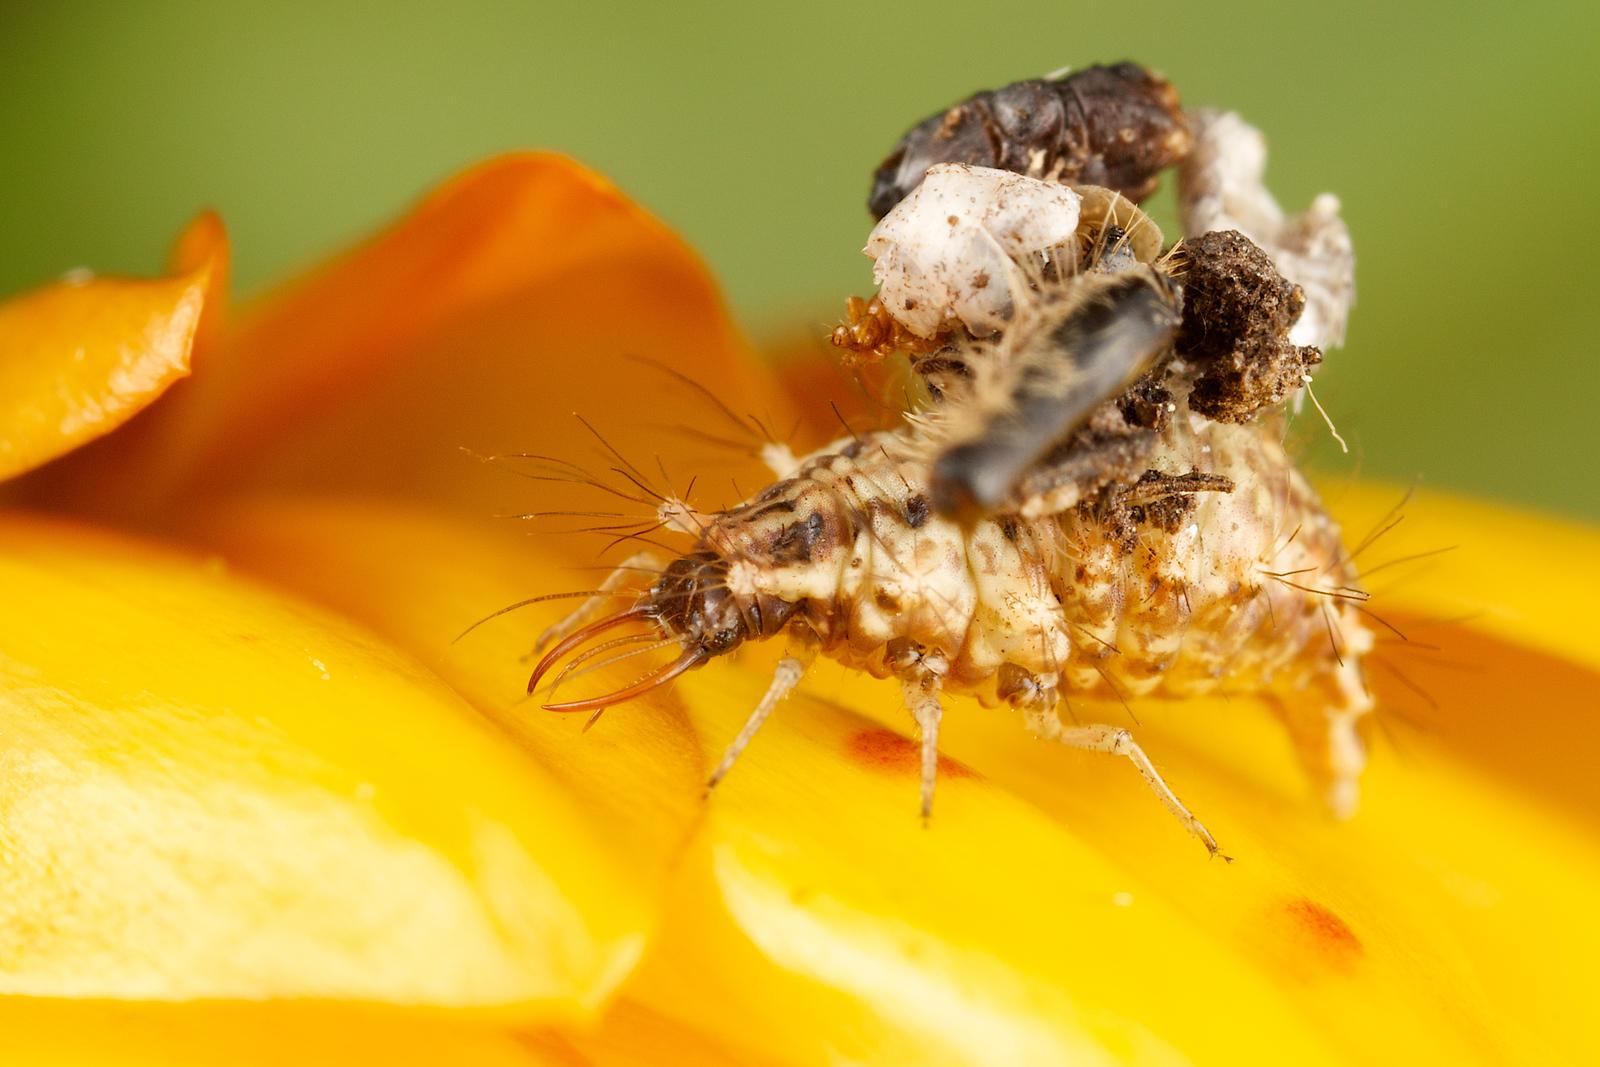 Lacewing on Orange Flower